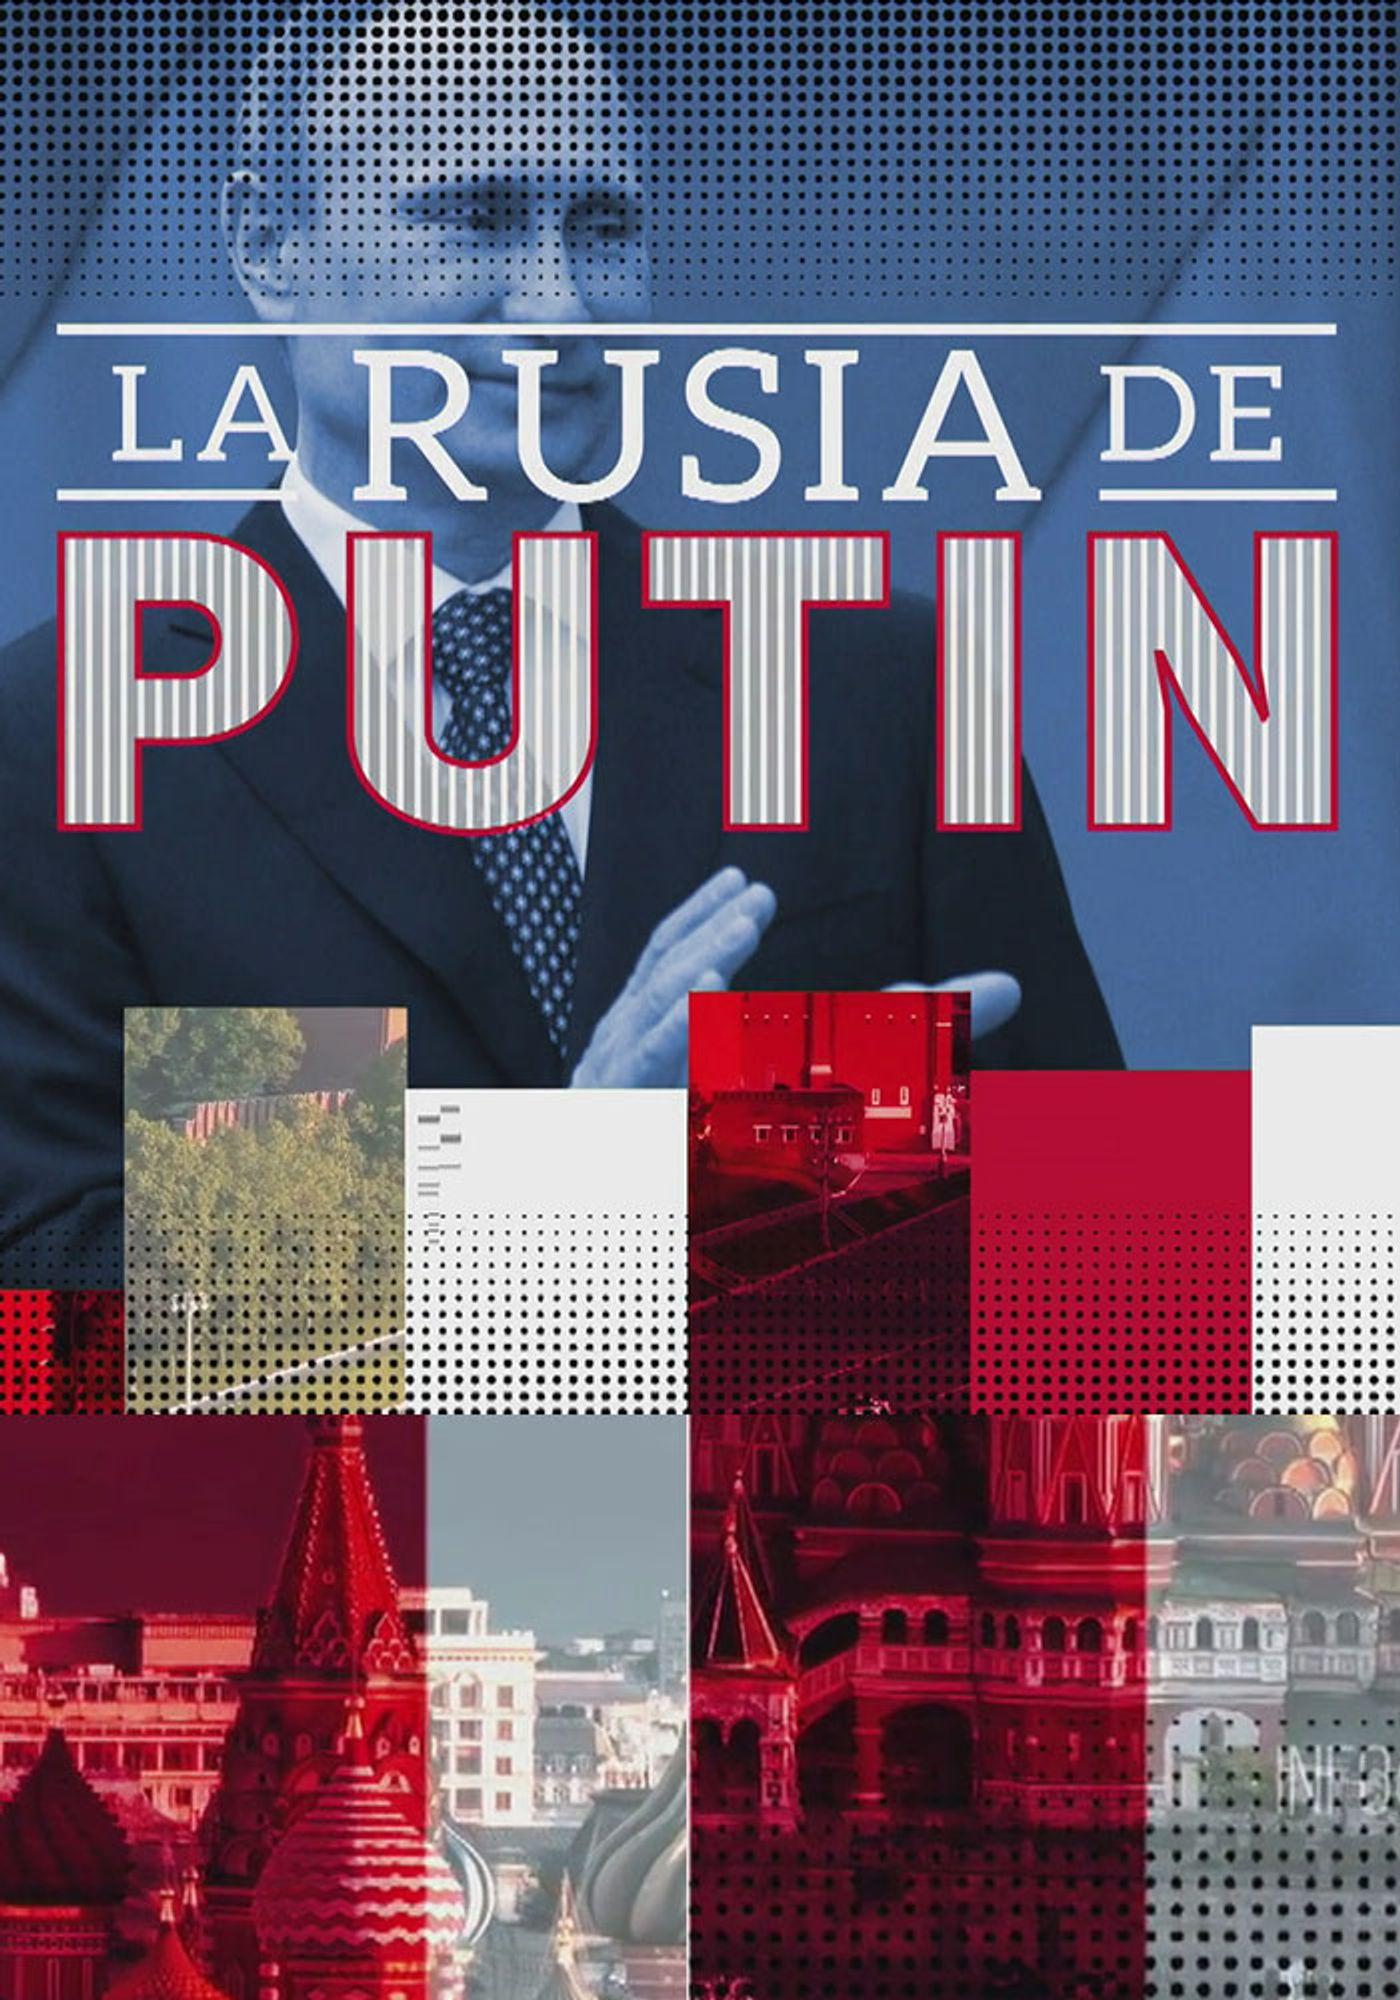 el9r2552s9sl_larusia_putin_poster.jpg